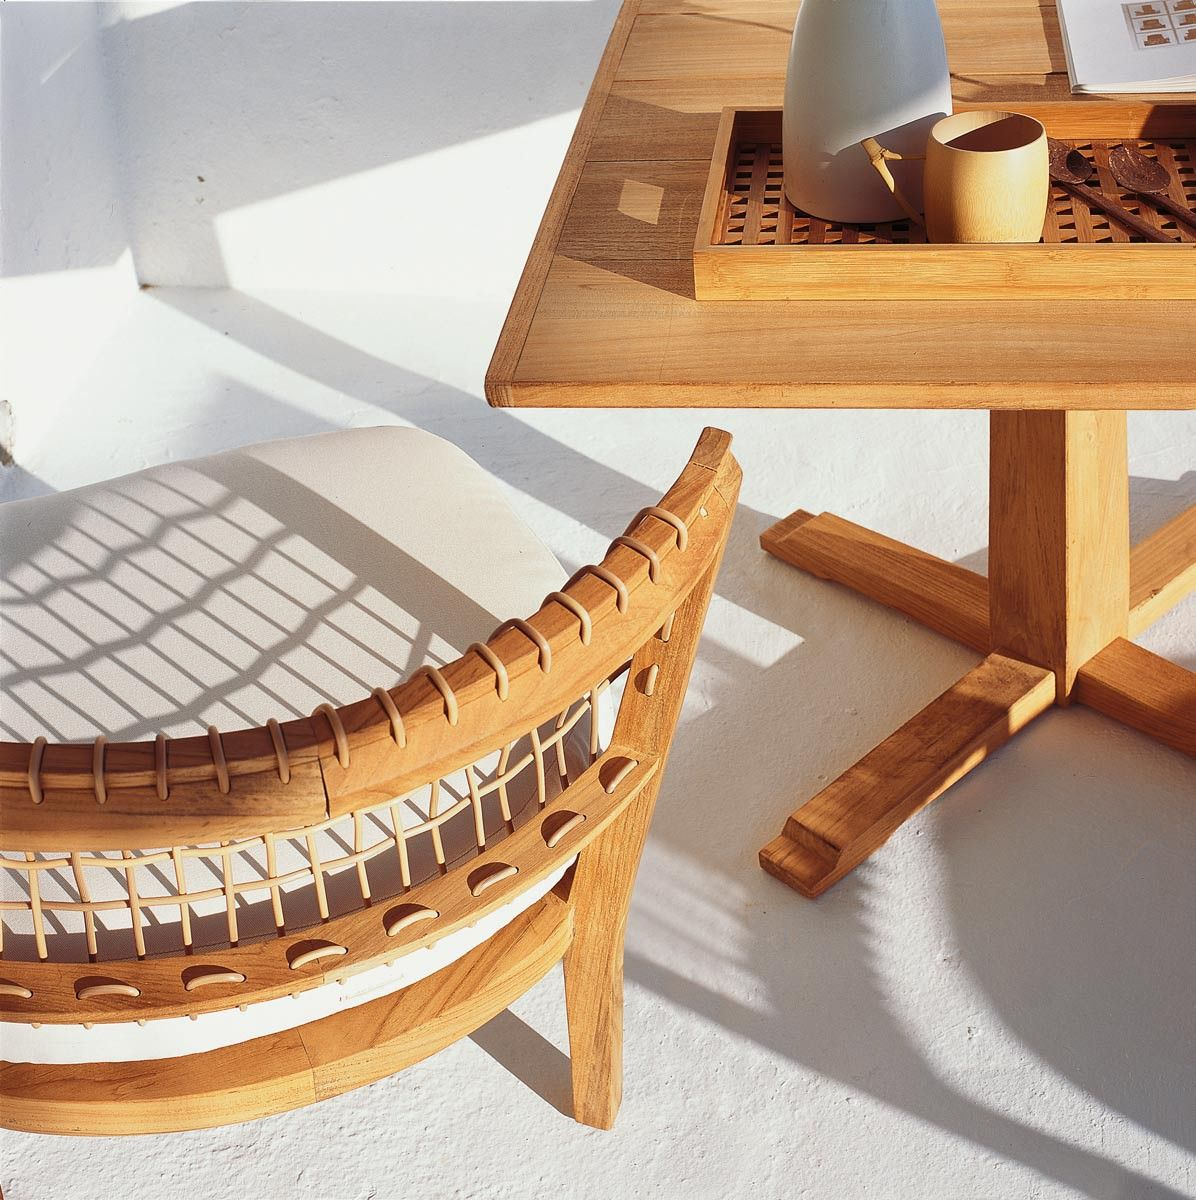 petit fauteuil bas synthesis unopi carrega pinterest fauteuil bas petit fauteuil et. Black Bedroom Furniture Sets. Home Design Ideas